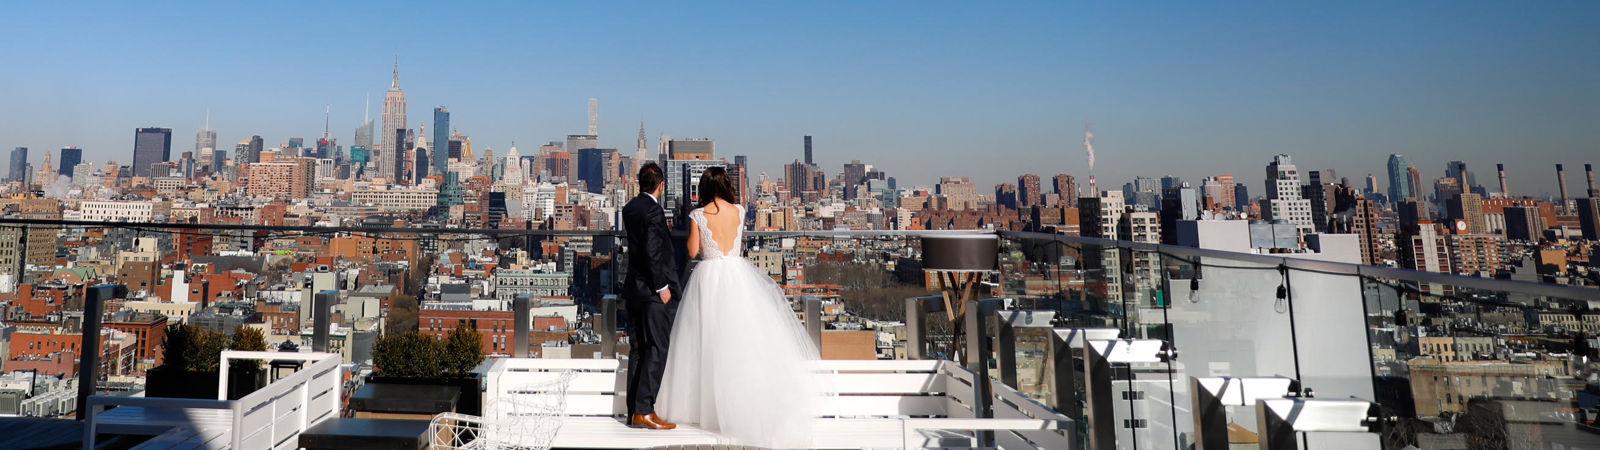 wedding at crown